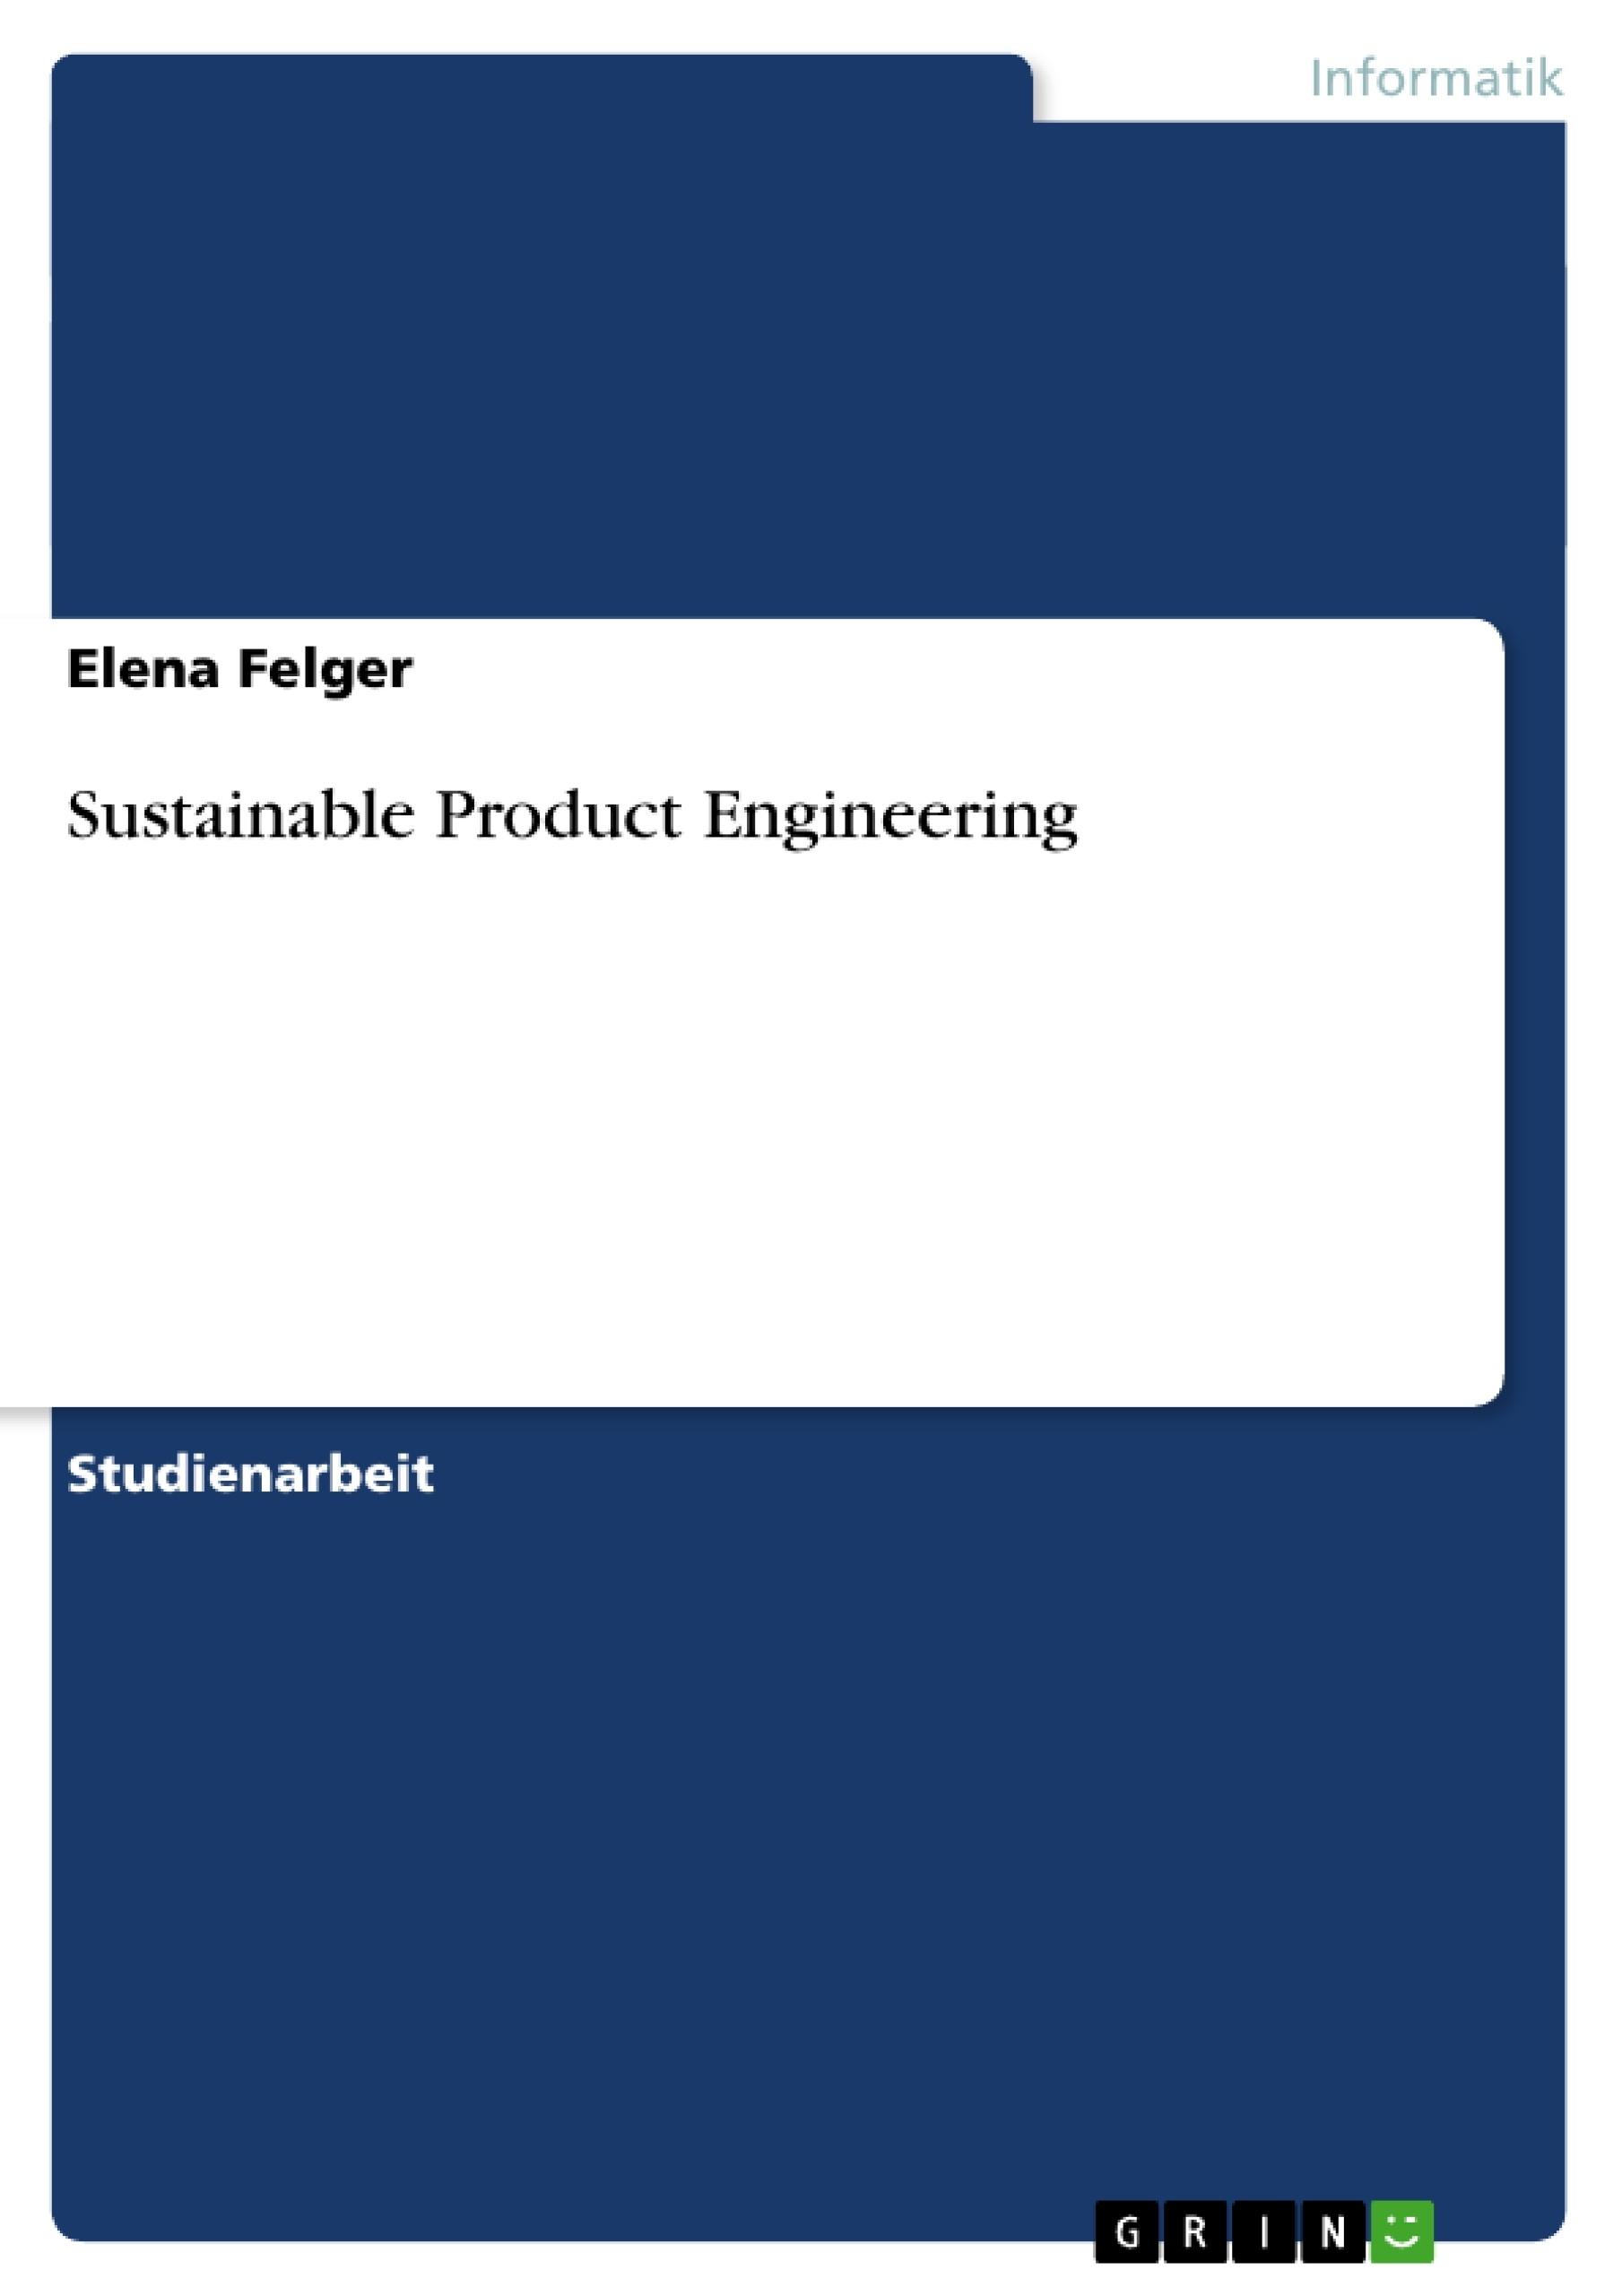 Titel: Sustainable Product Engineering